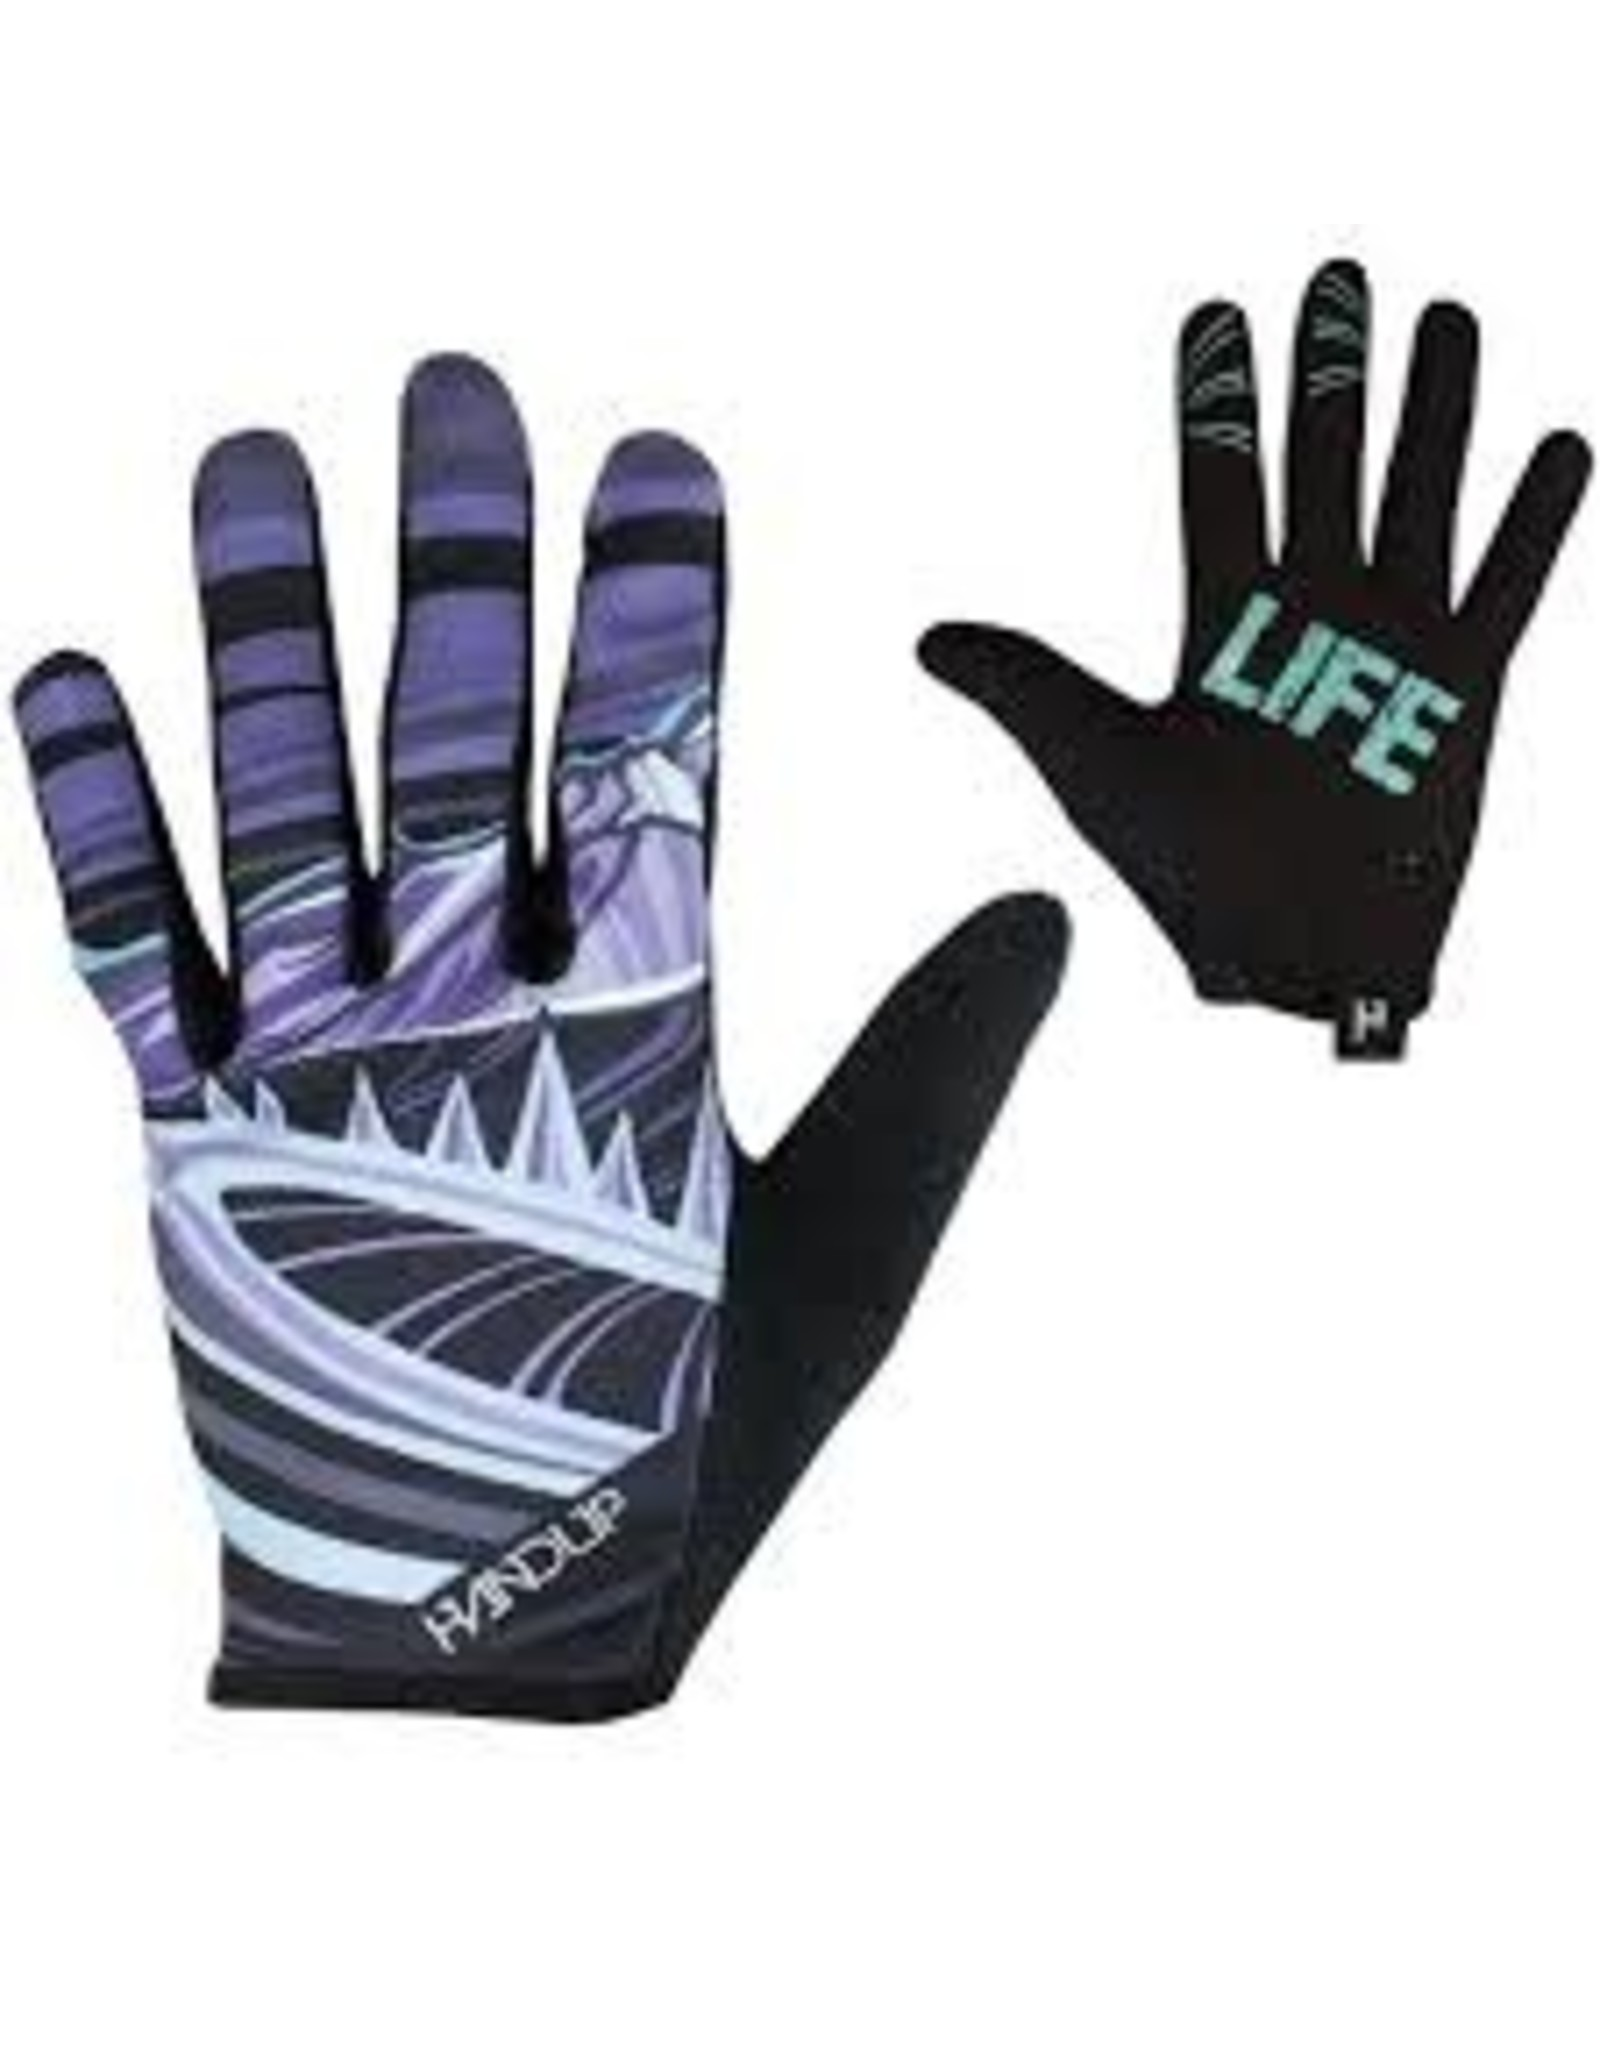 Glove Handup Mtn Life Purple/Teal XL